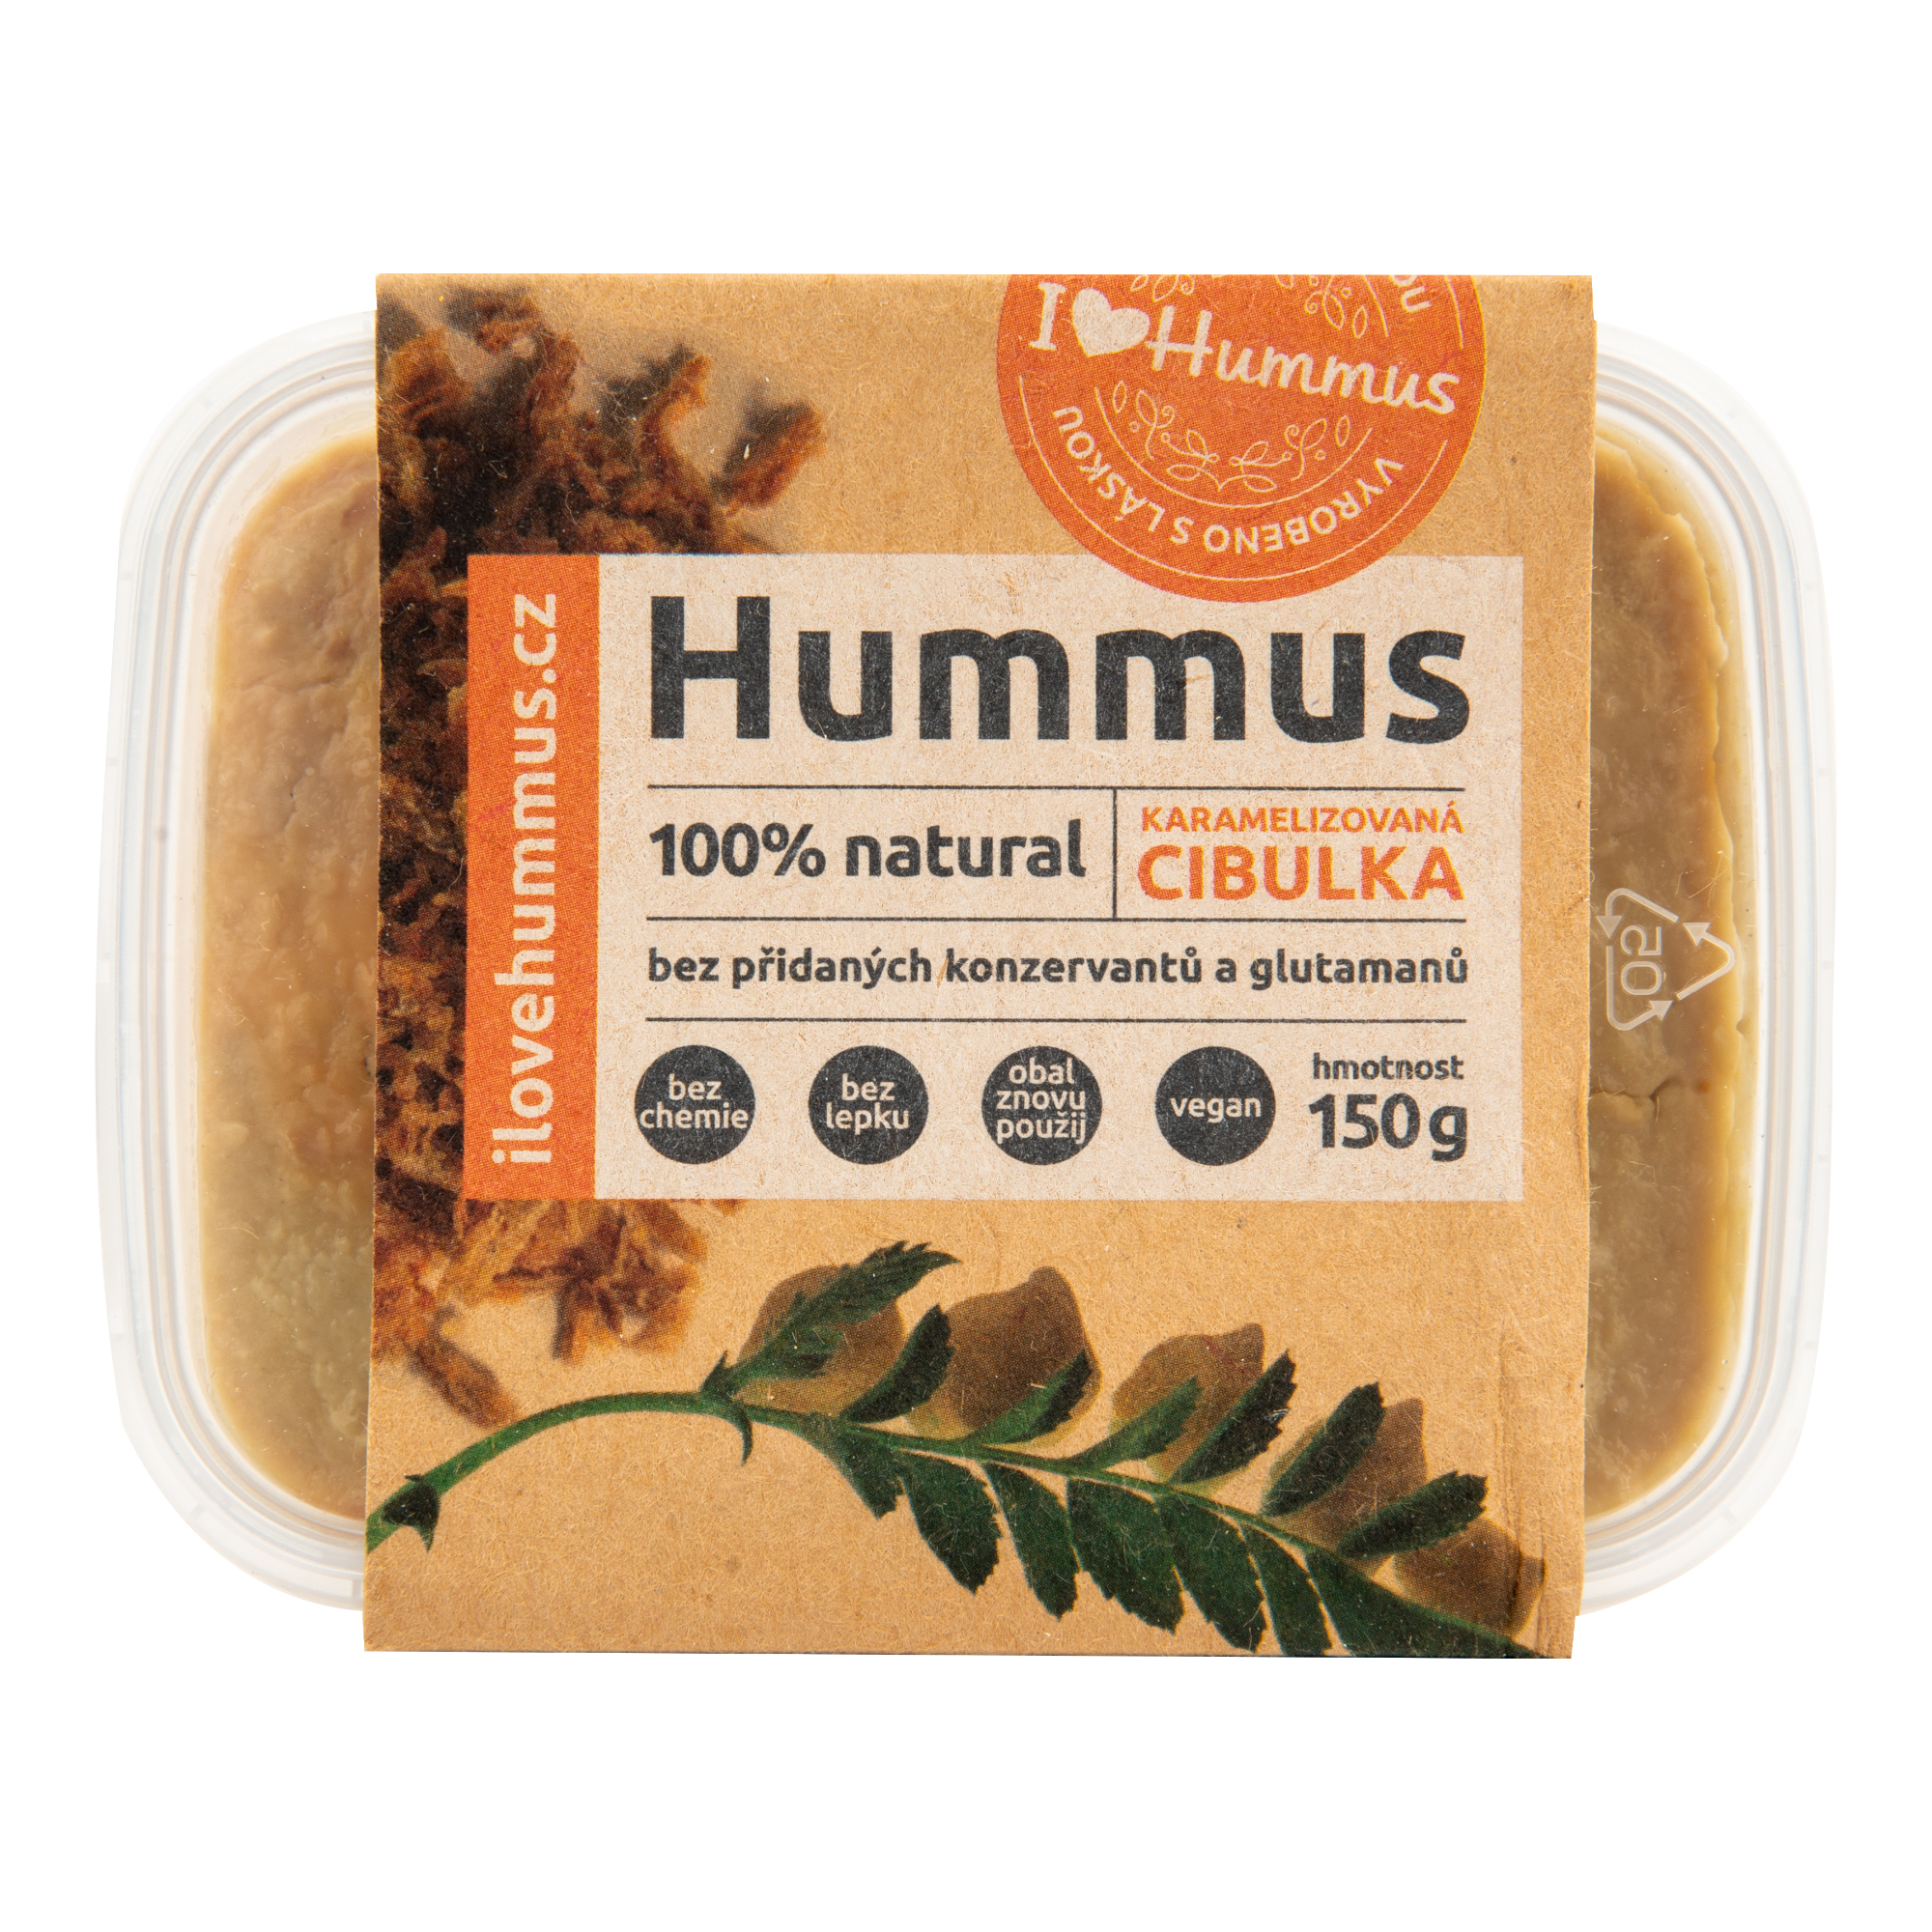 Hummus cibulka karamelizovaná 150g